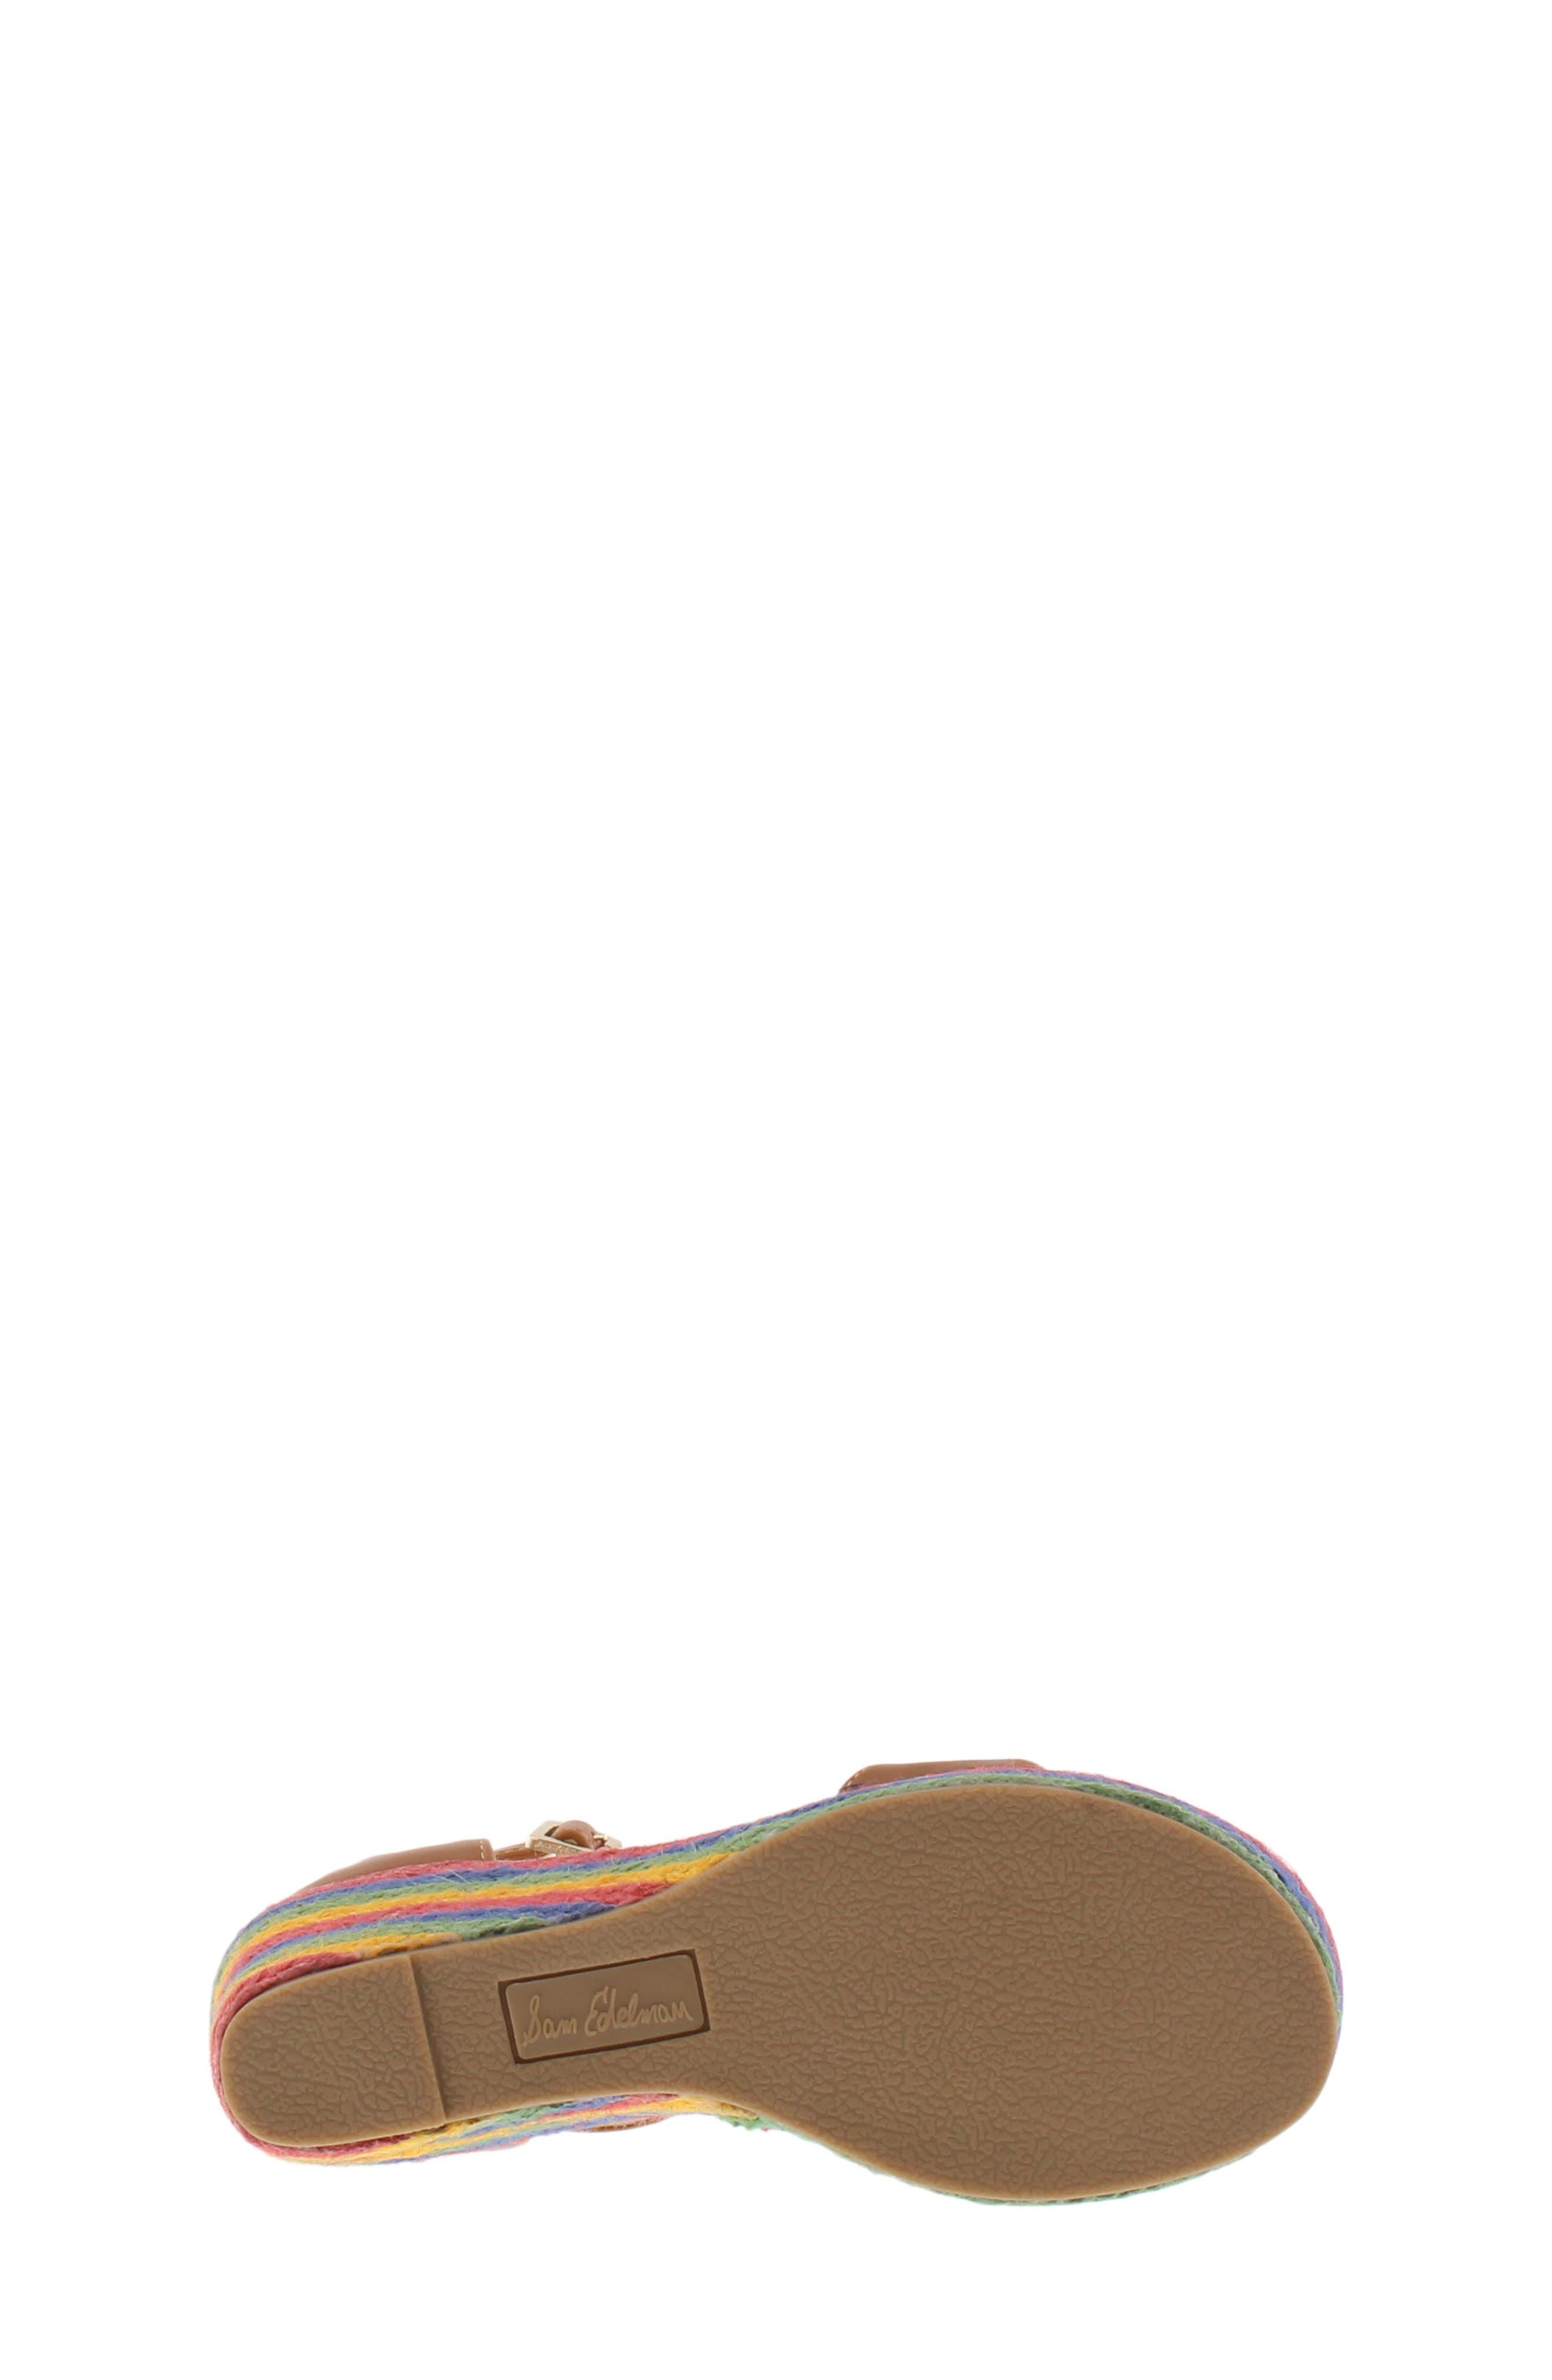 Azalia Ray Wedge Sandal,                             Alternate thumbnail 6, color,                             SADDLE